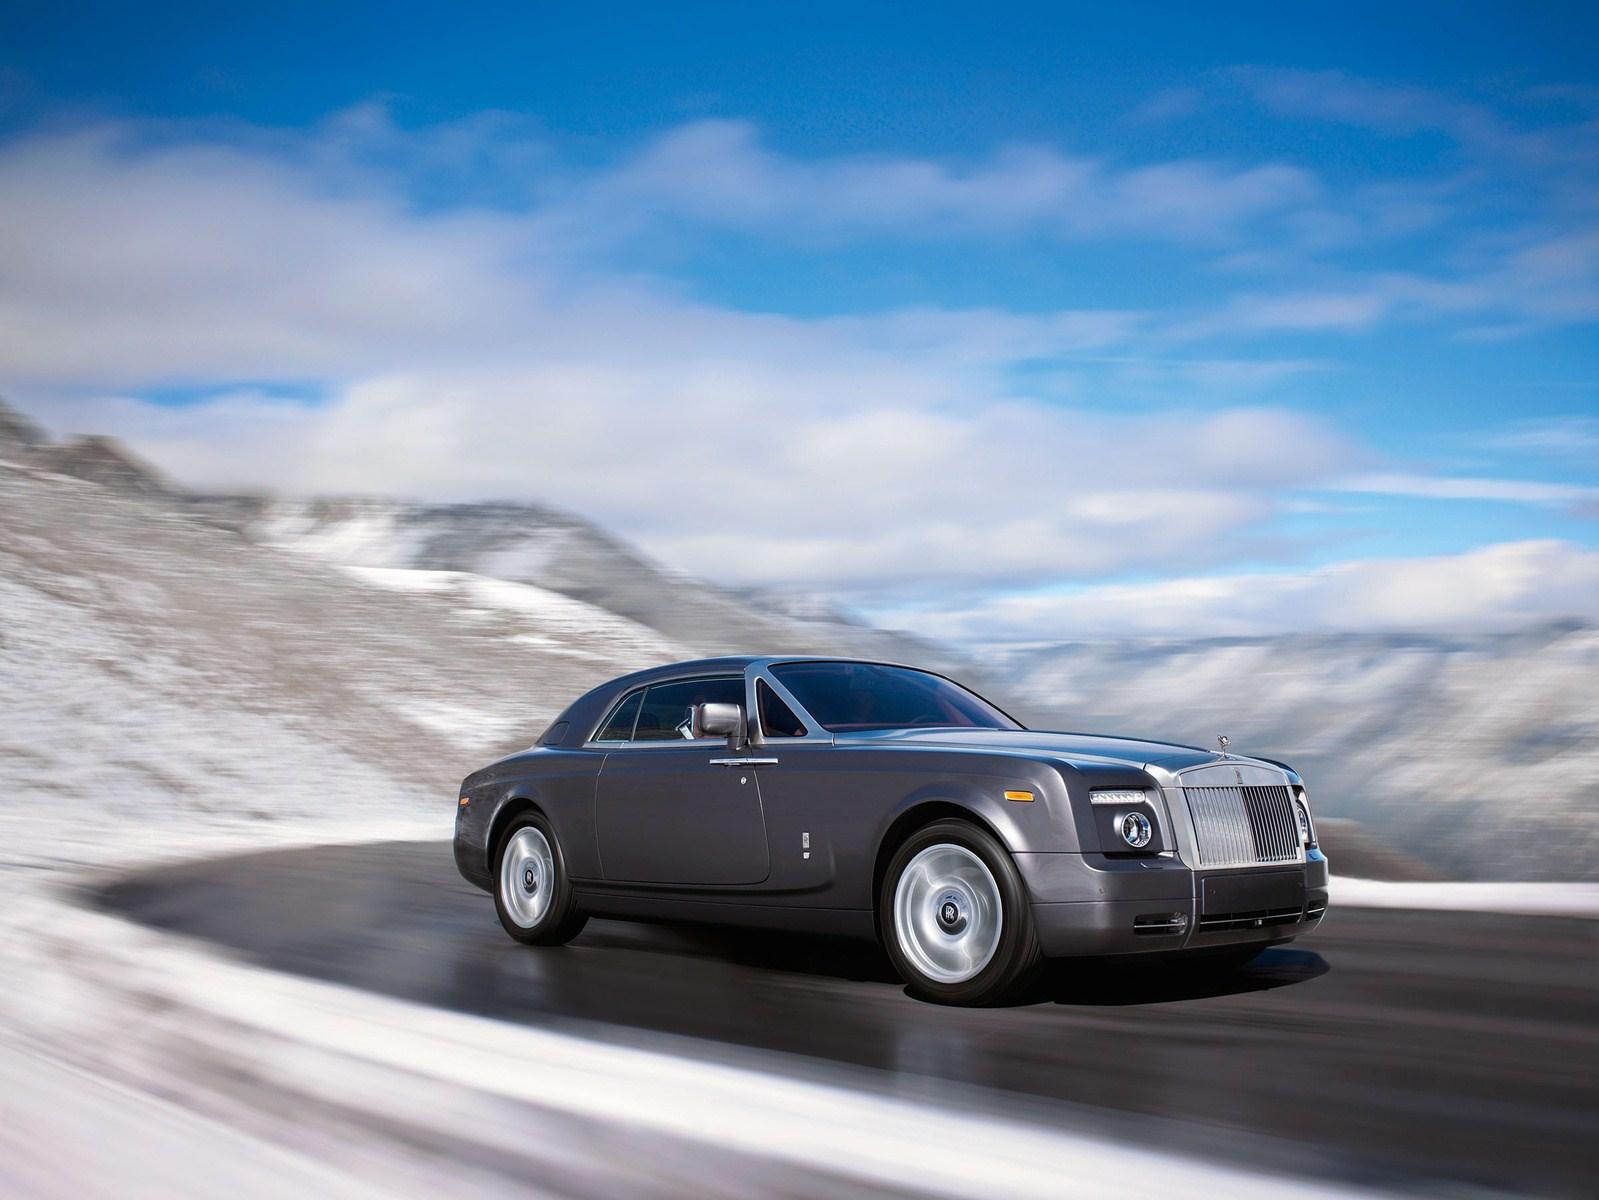 2015 Rolls Royce Wraith Drophead Wallpapers